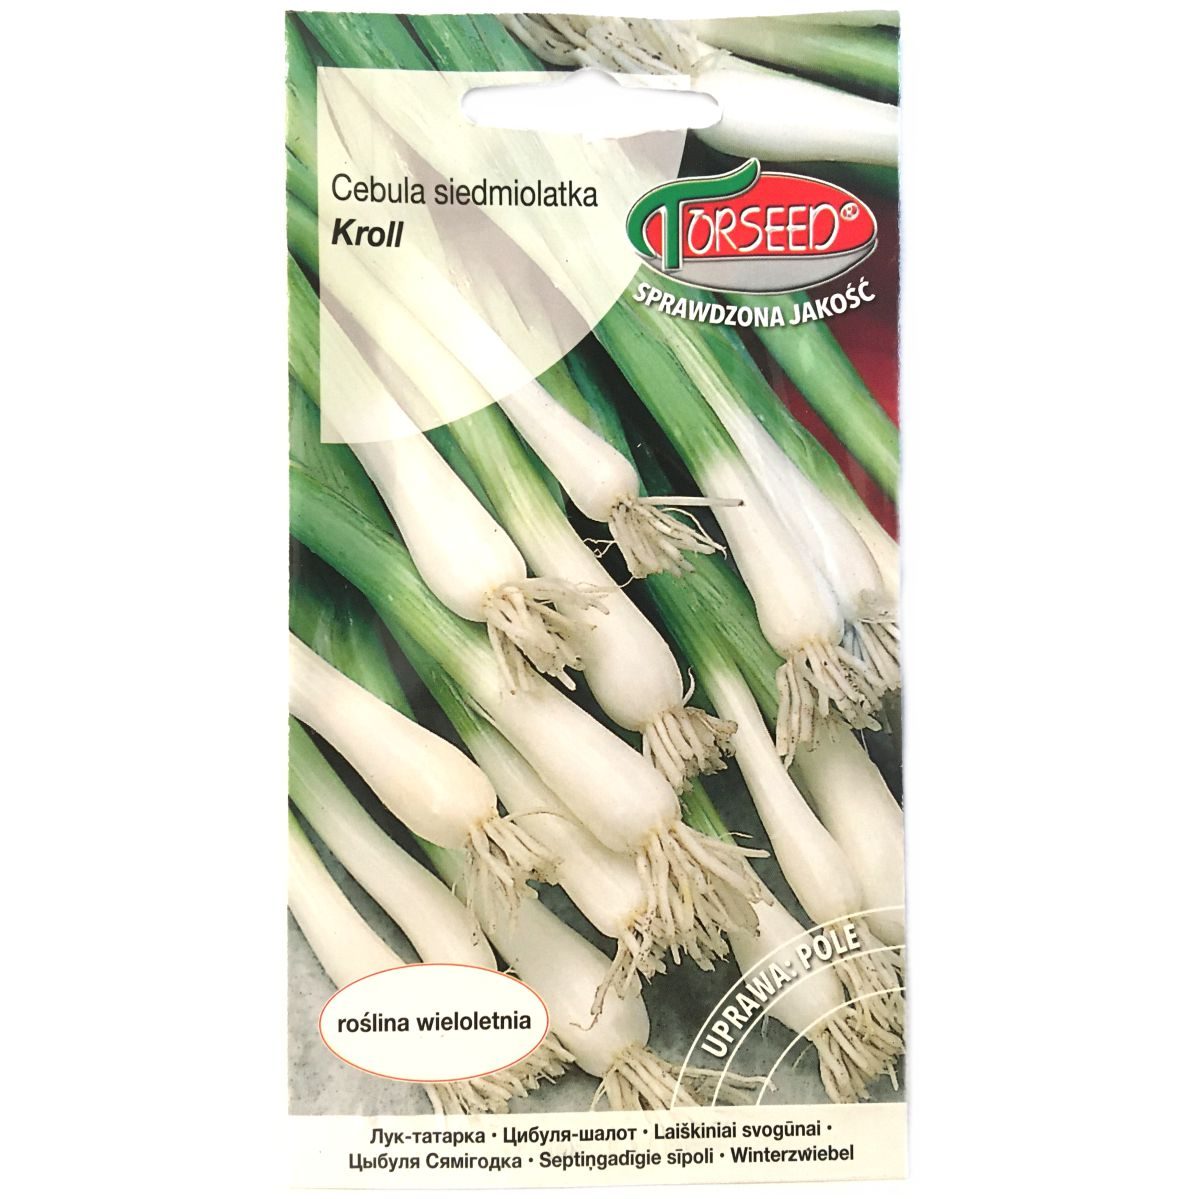 Cebula siedmiolatka Kroll nasiona Torseed